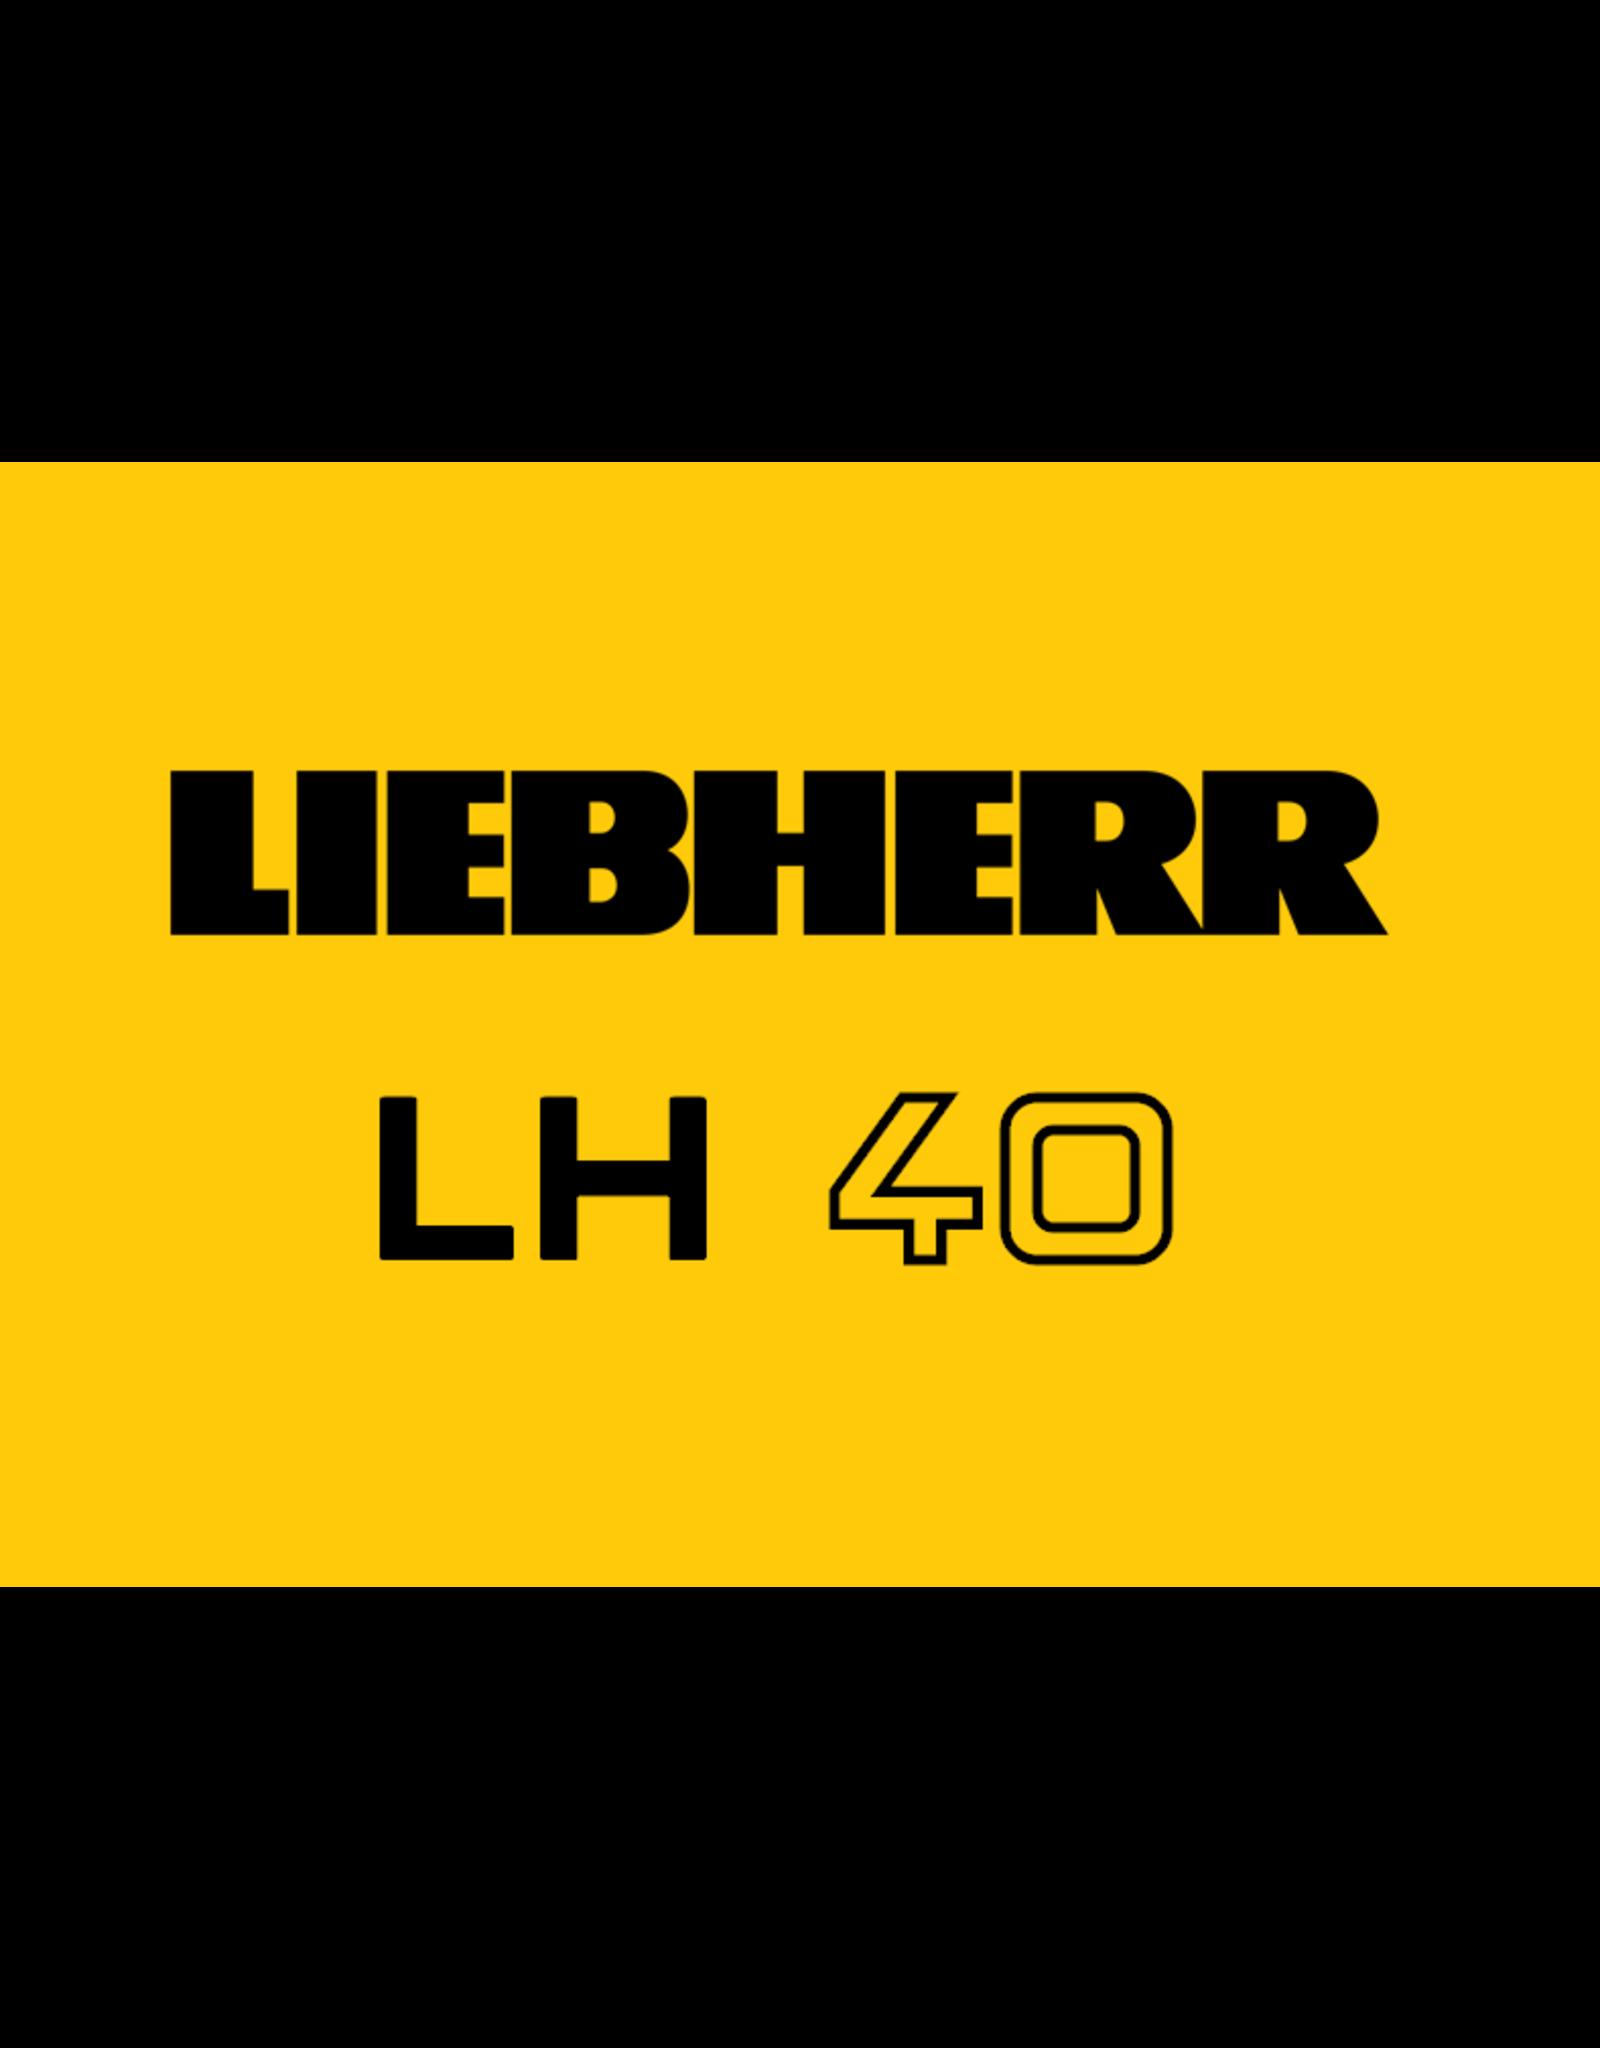 Echle Hartstahl GmbH FOPS pour Liebherr LH 40